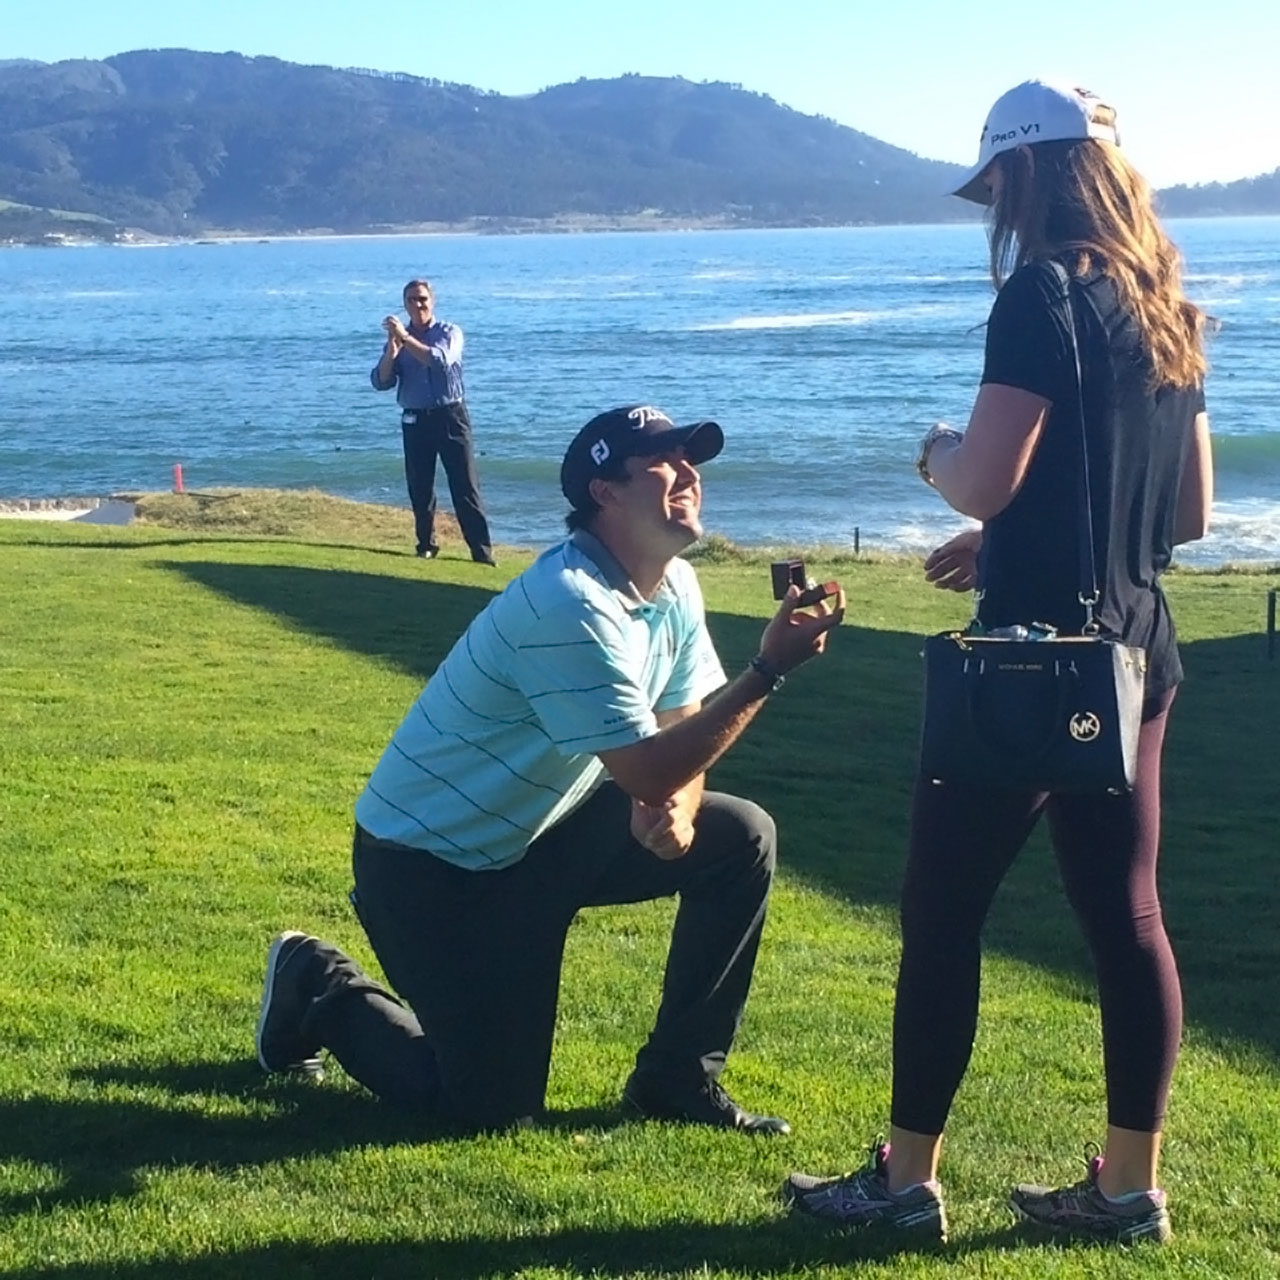 PGA Tour golfer Mark Hubbard makes marriage proposal at Pebble Beach